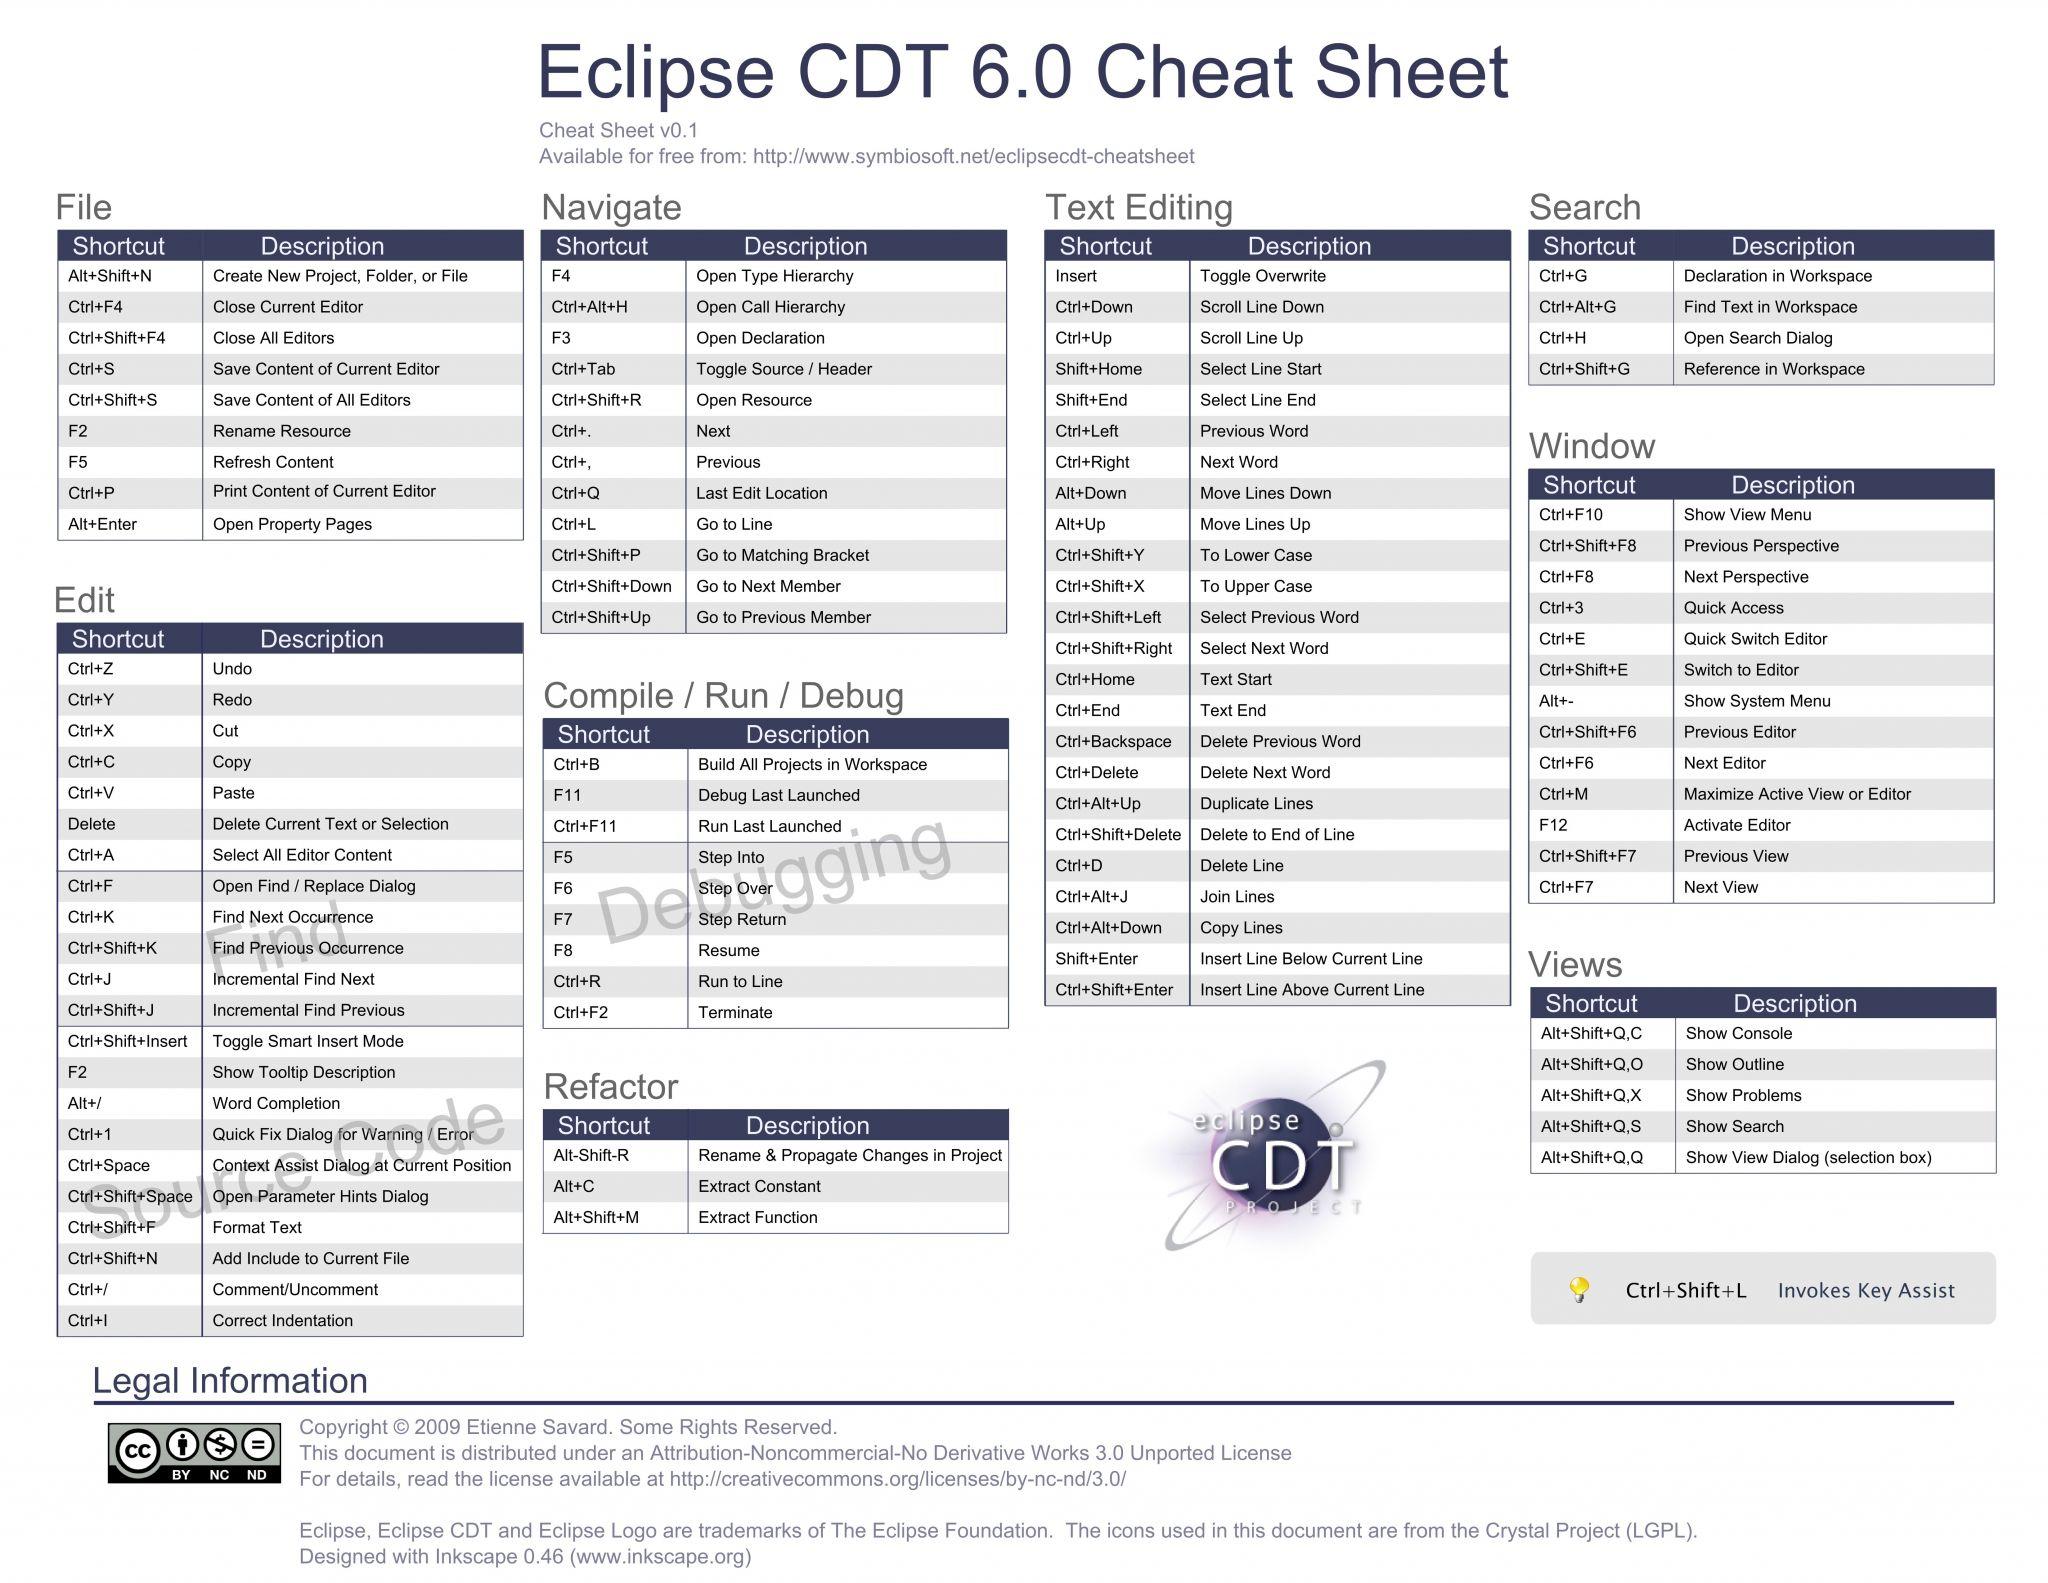 Eclipse Worksheet Answer Key